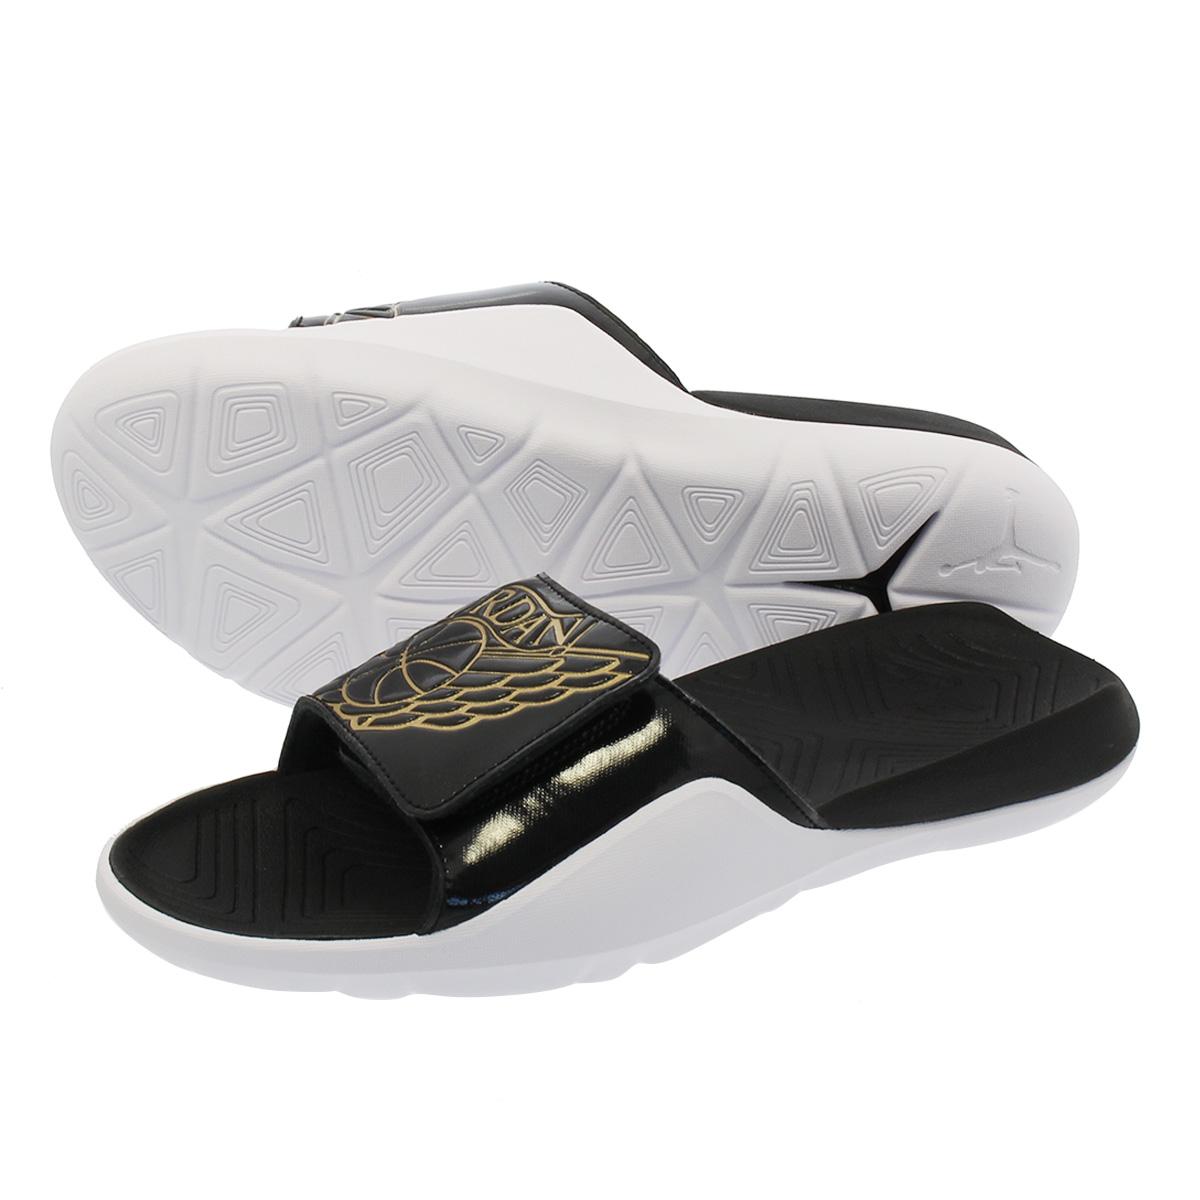 cheap for discount b811b 3f7c2 LOWTEX PLUS: NIKE JORDAN HYDRO 7 Nike Jordan high mud 7 ...